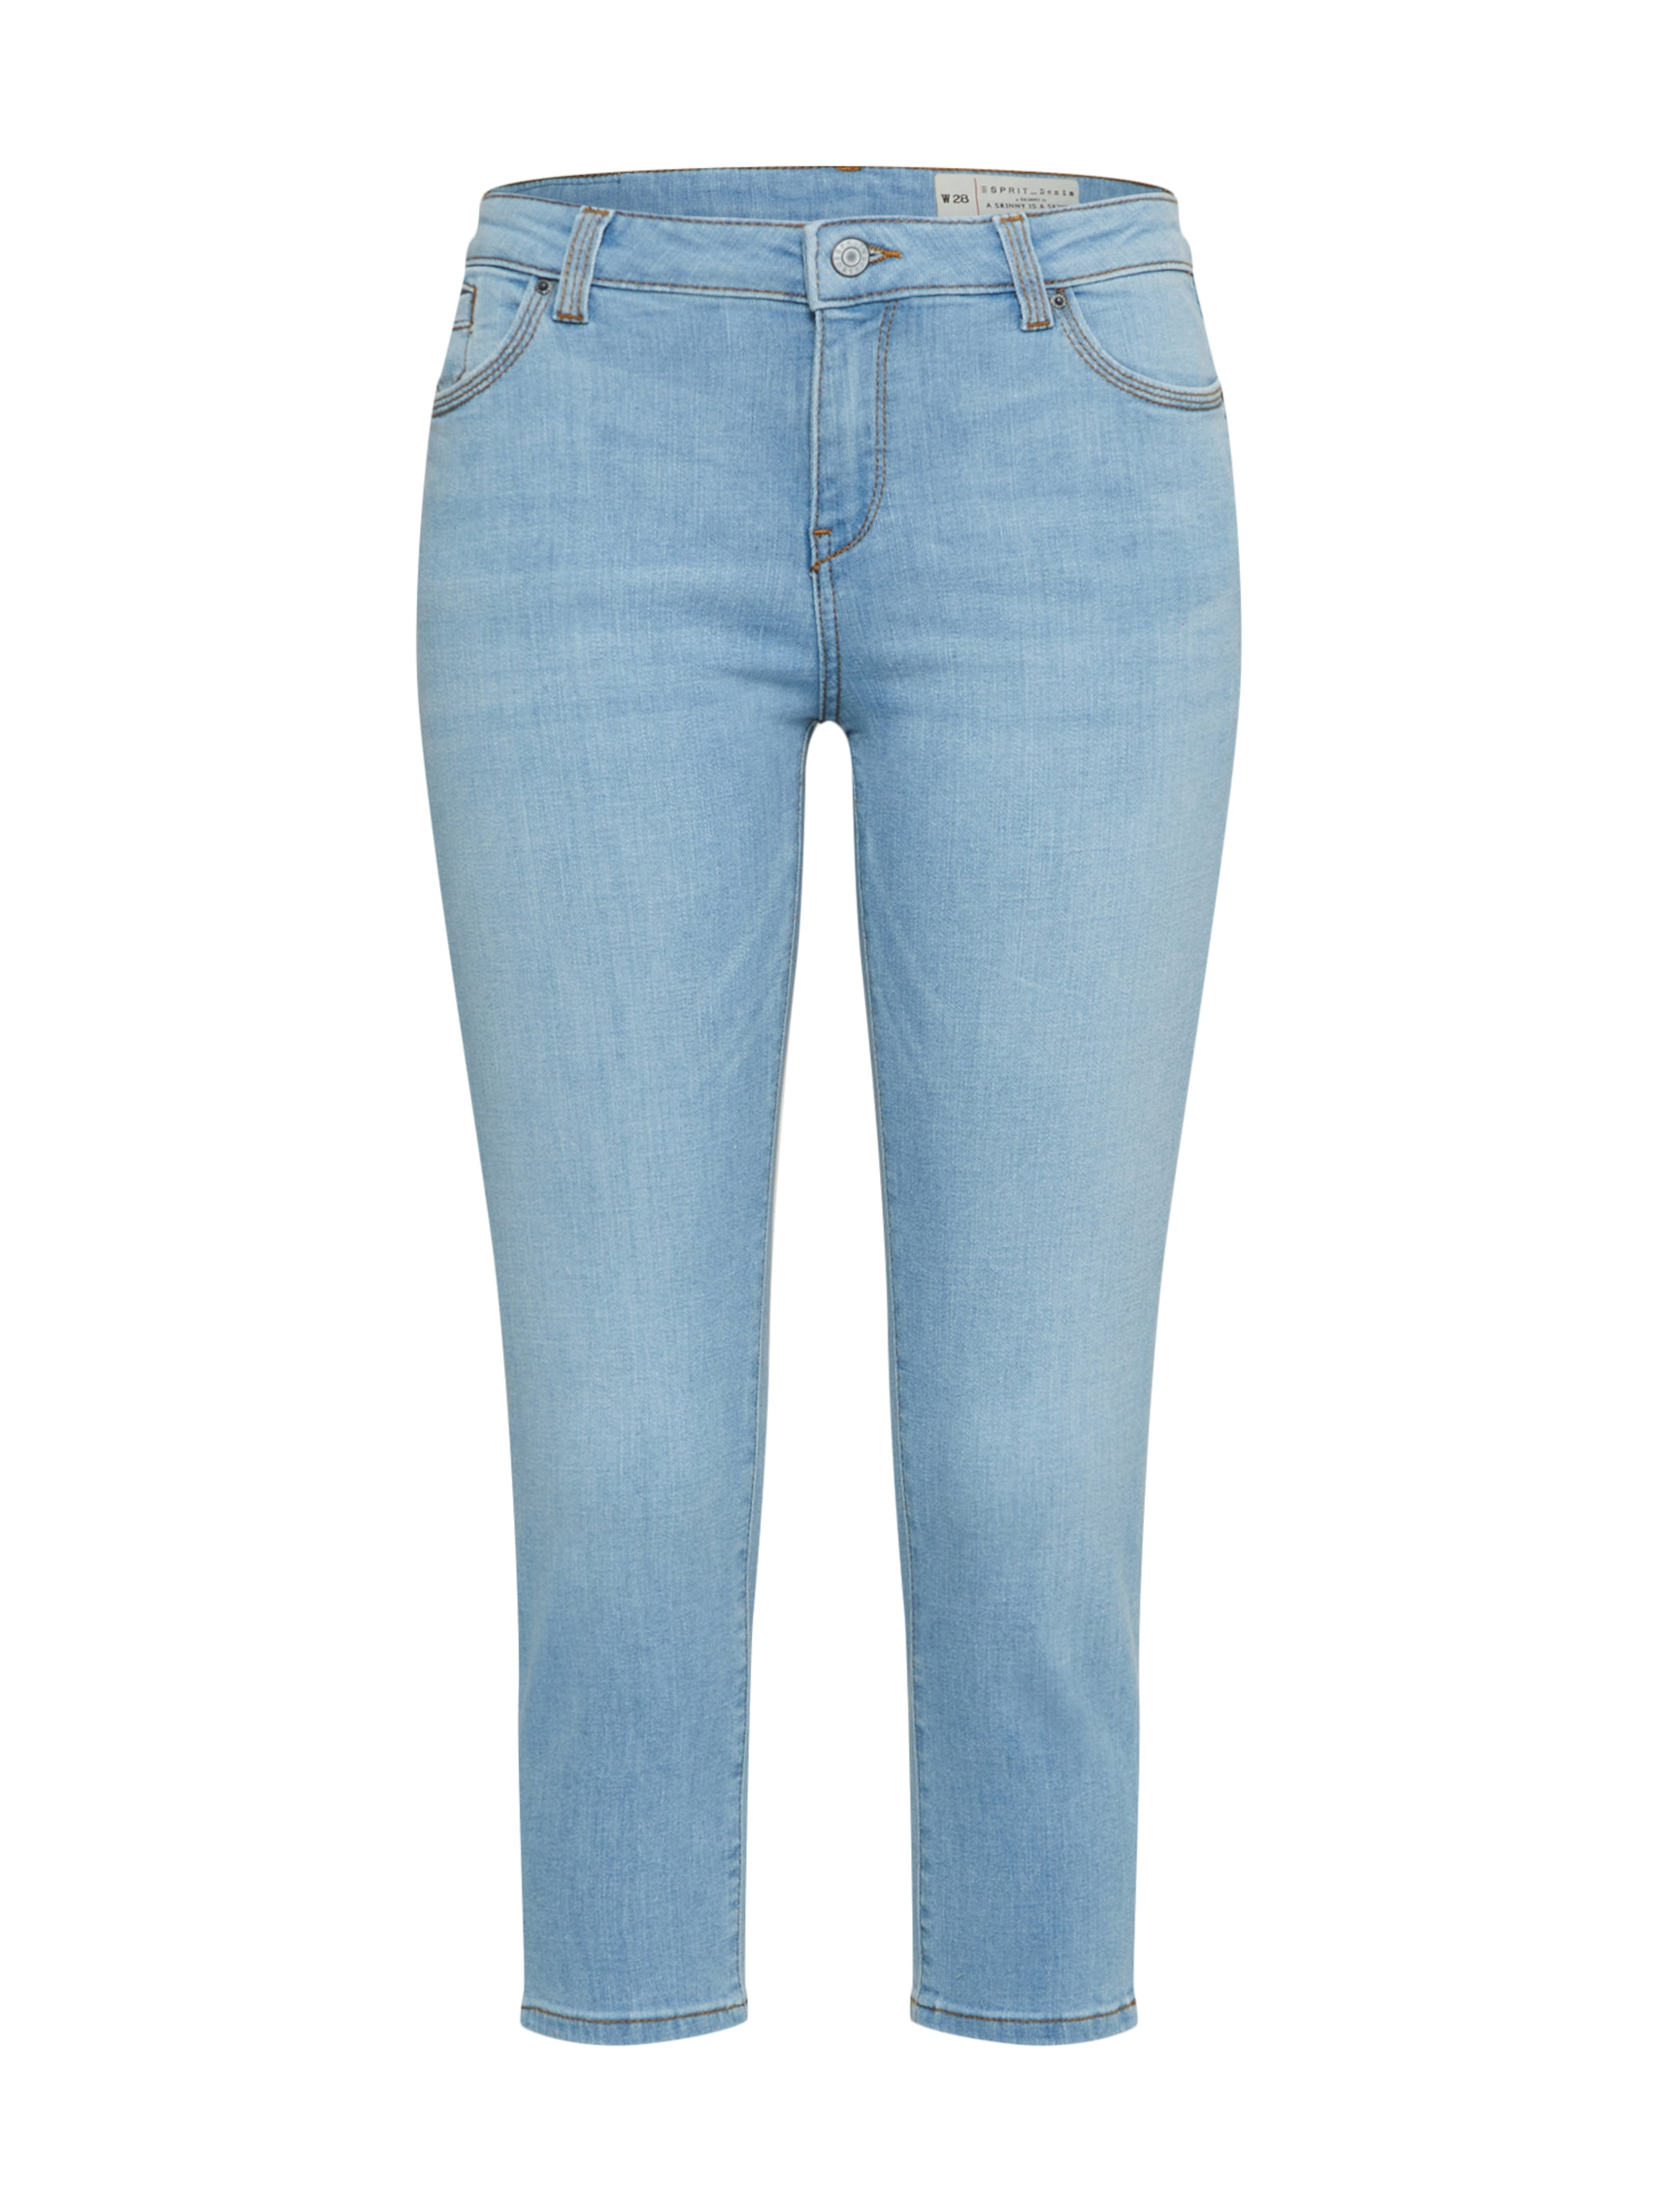 In Esprit Jeans Jeans In Esprit Esprit Jeans Lichtblauw In Lichtblauw nZ80OPwNXk